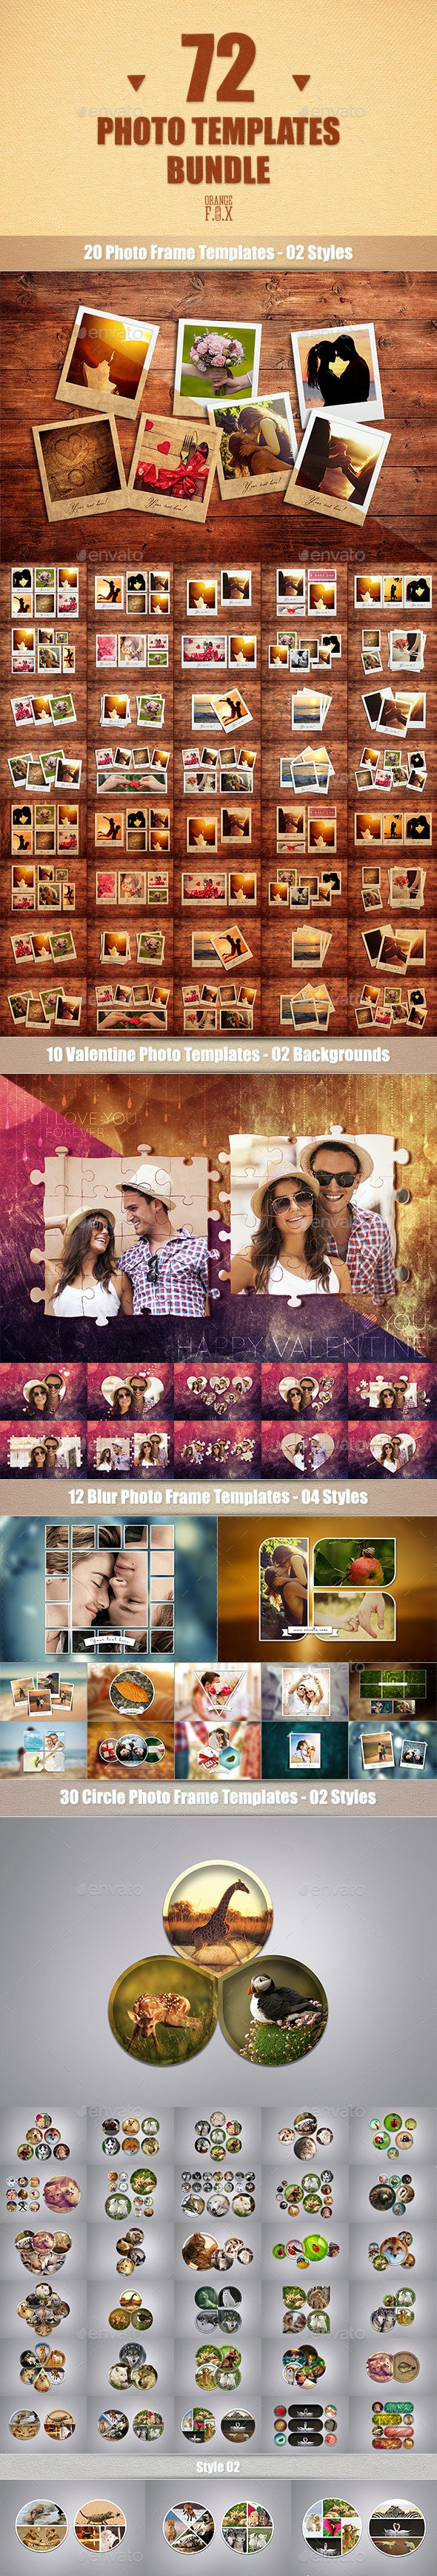 72 Photo Templates Bundle - Miscellaneous Photo Templates